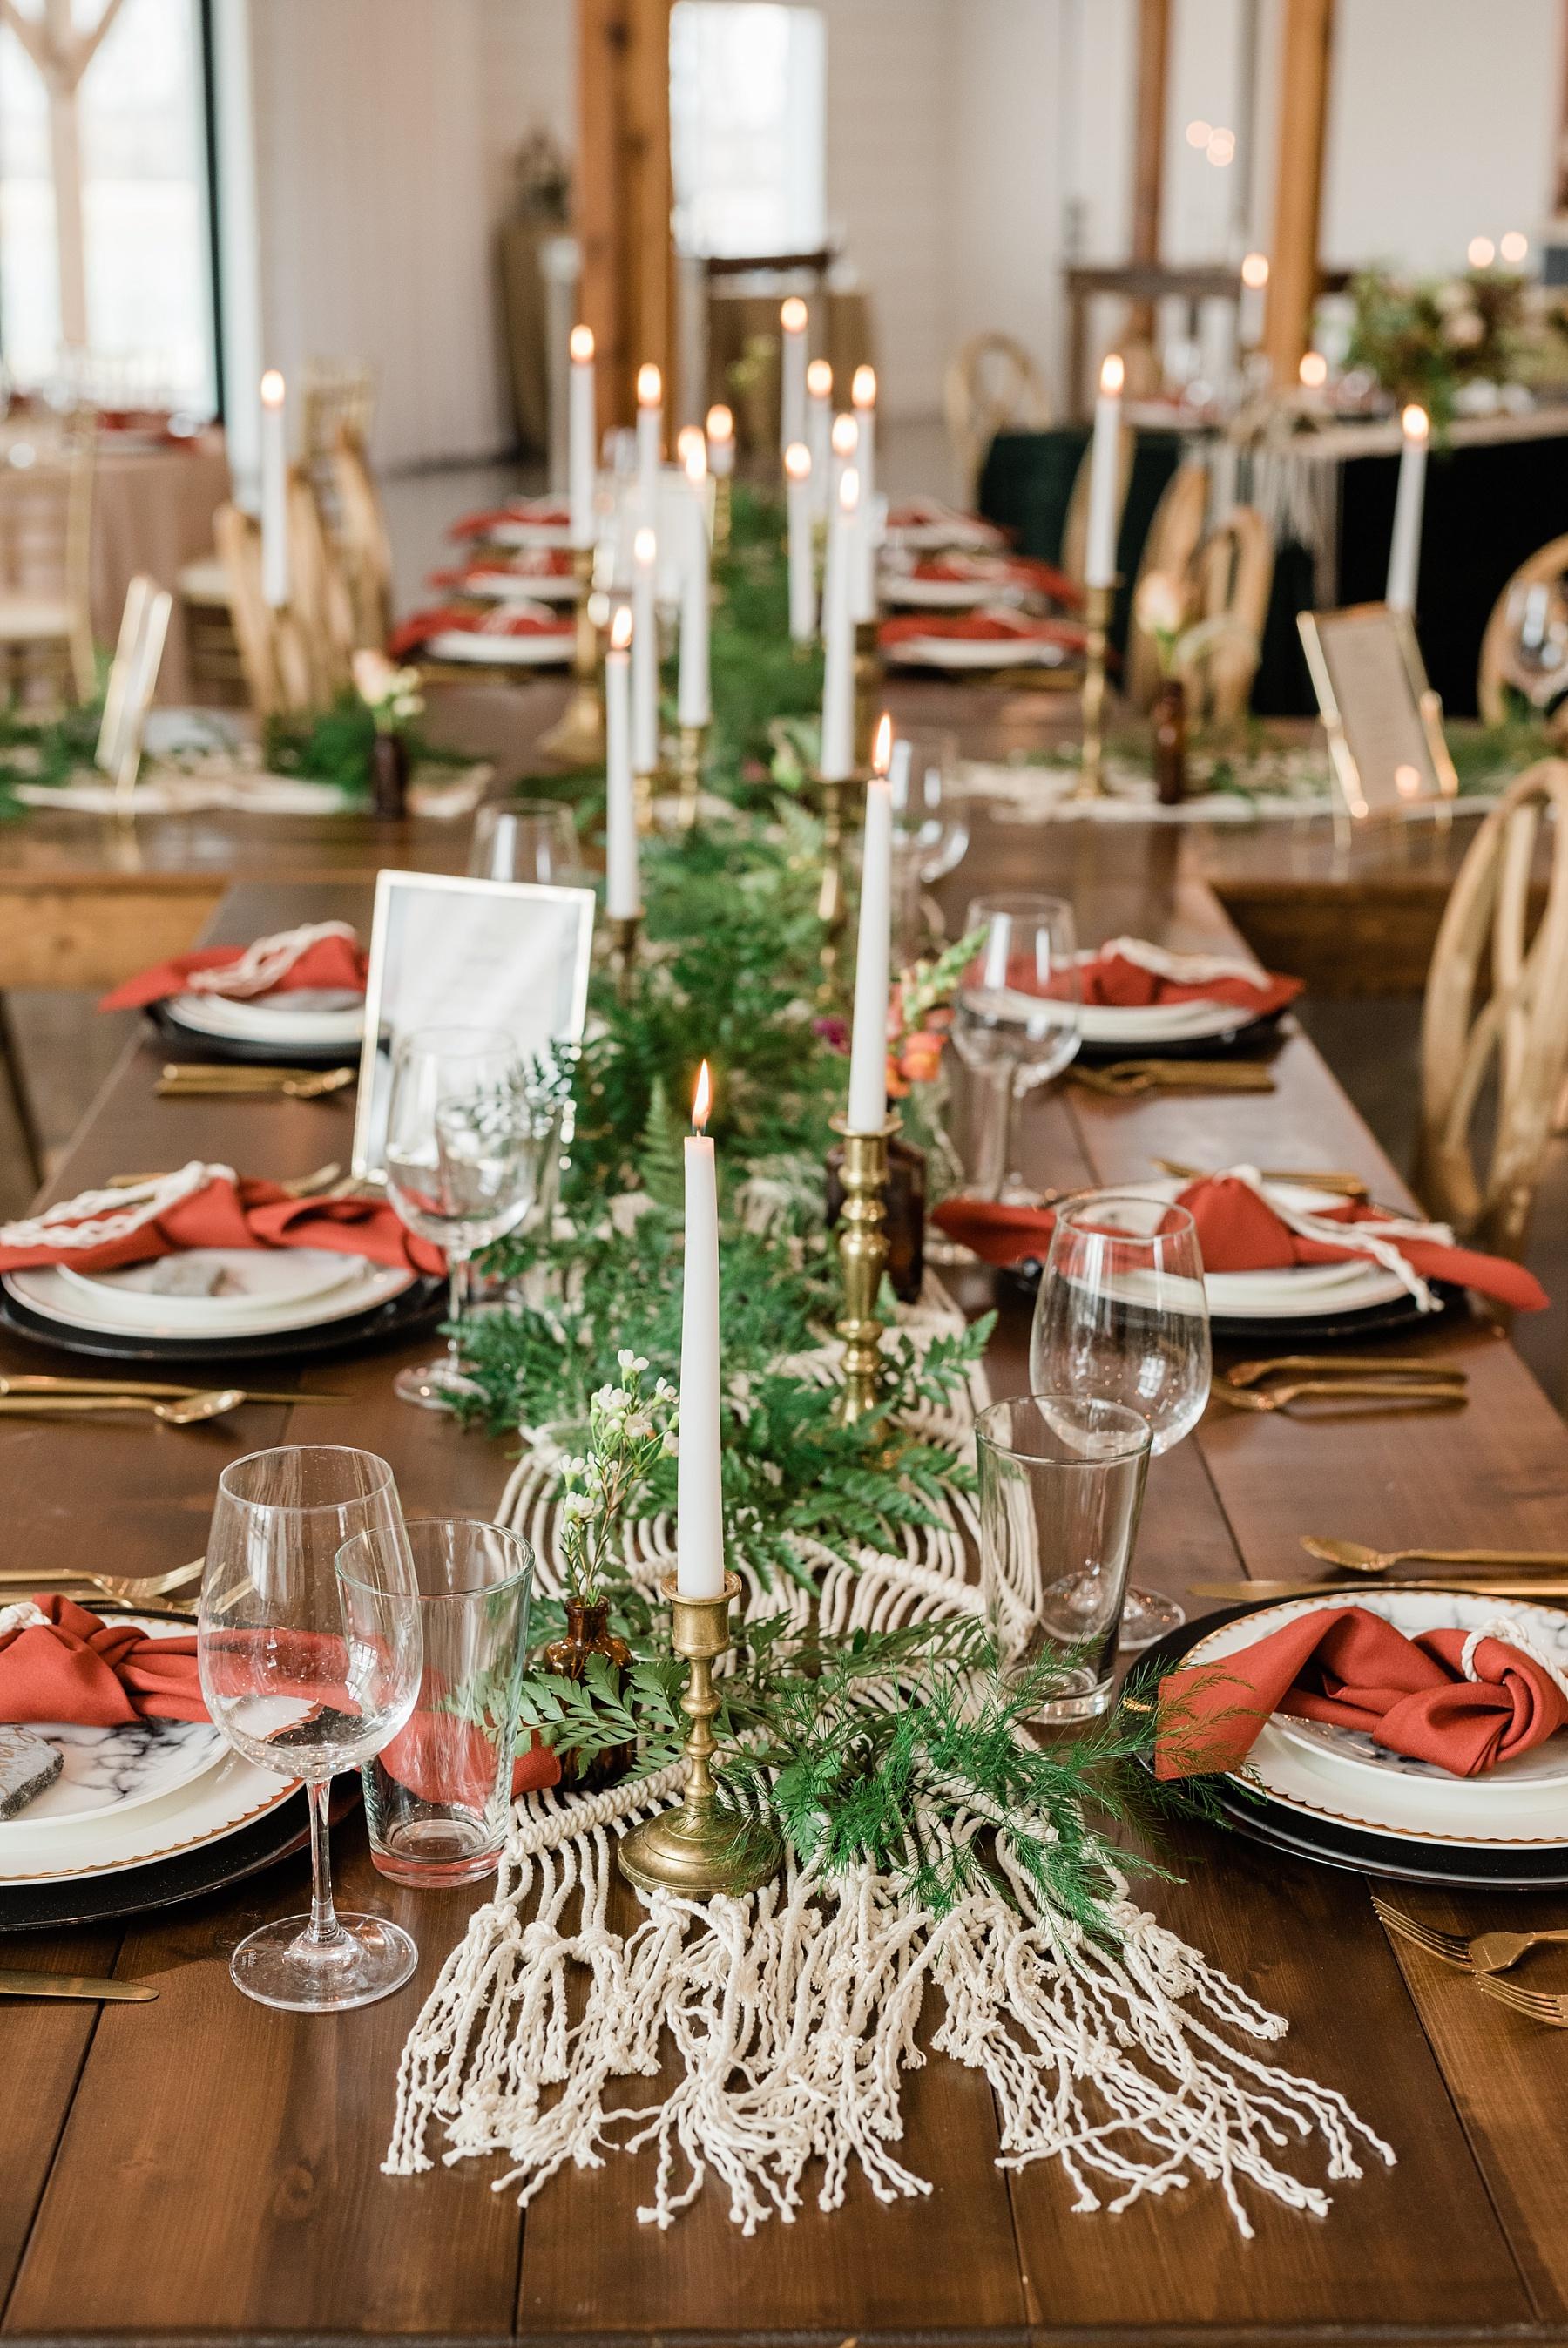 Eclectic Scandinavian Winter Wedding in All White Venue Emerson Fields by Kelsi Kliethermes Photography Best Missouri and Maui Wedding Photographer_0089.jpg